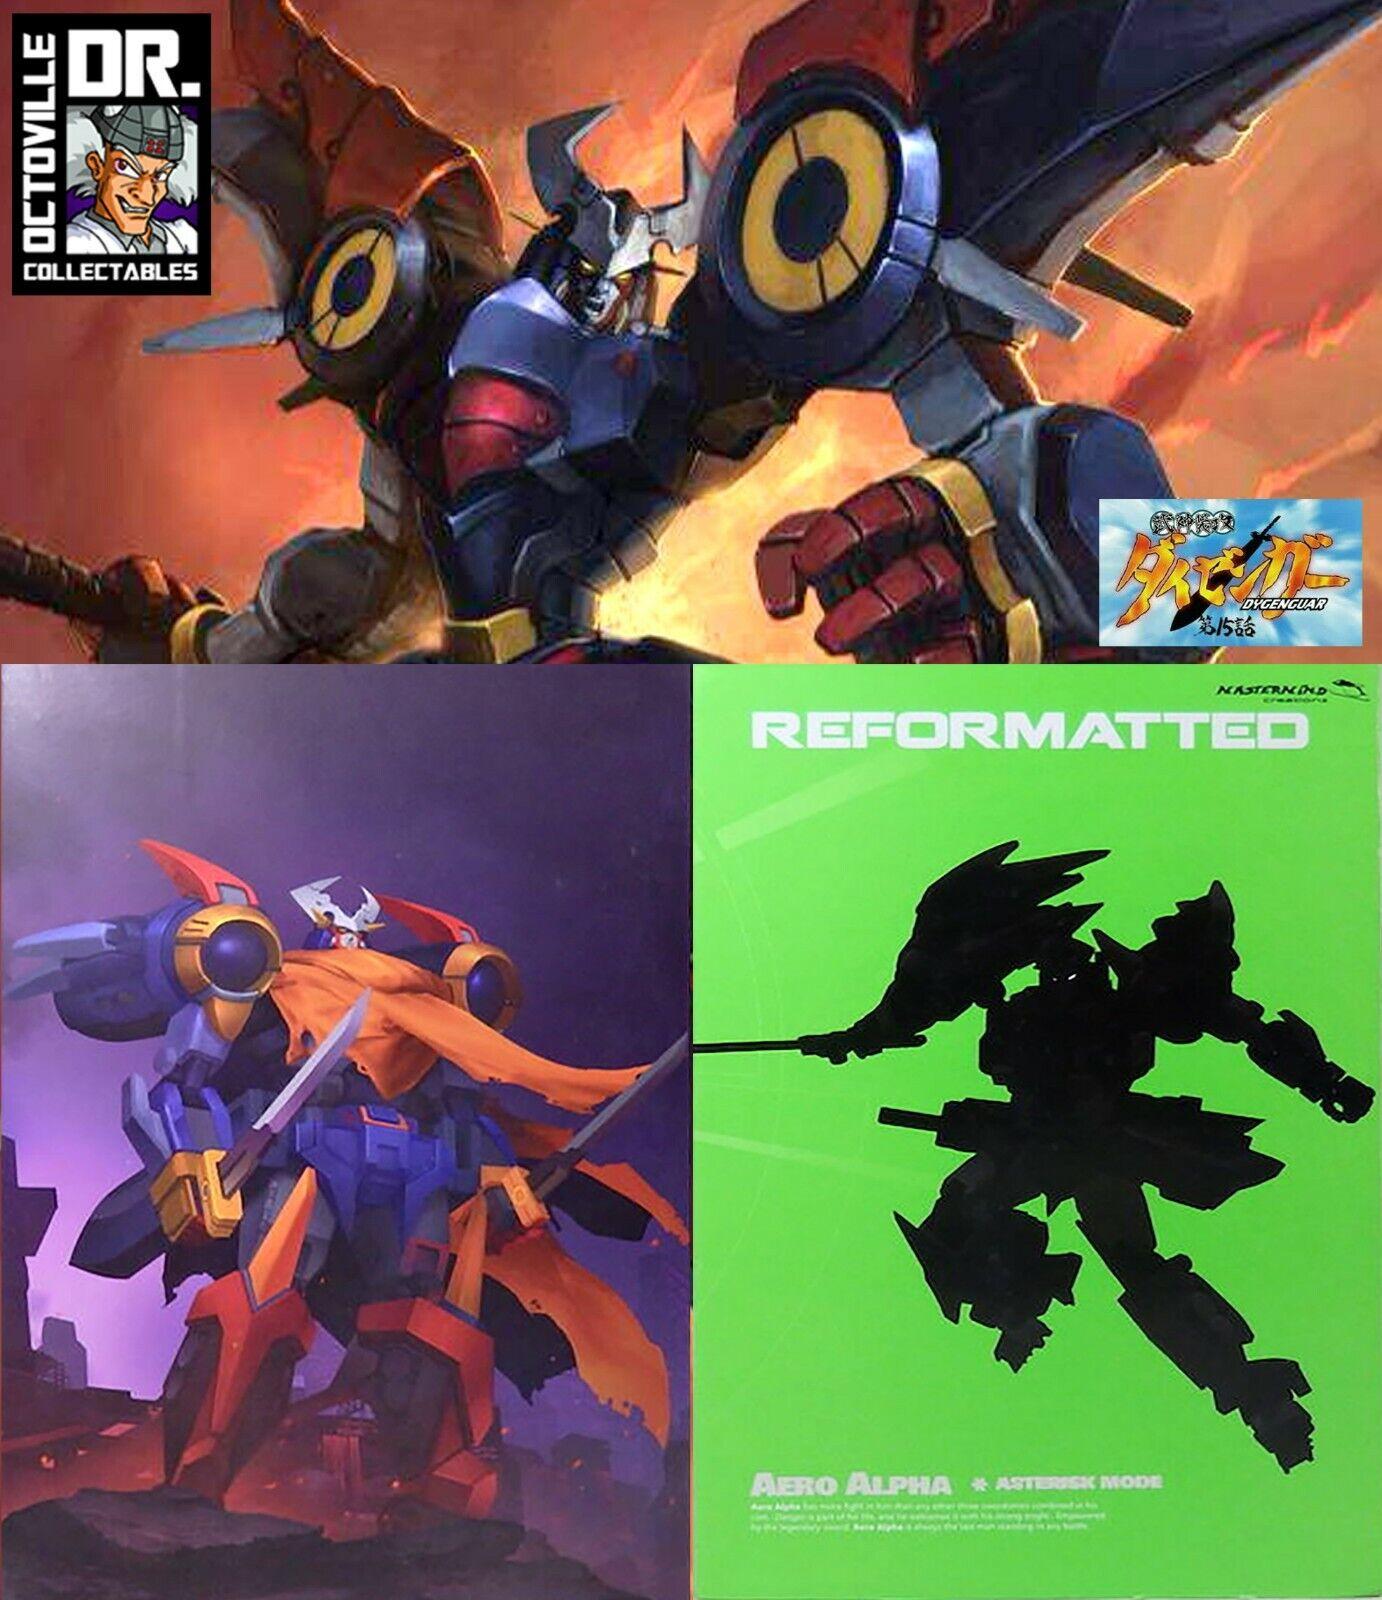 Transformers Mastermind Creations R-29AM Aero Alpha Asterisk Mode TFCon 2019 New